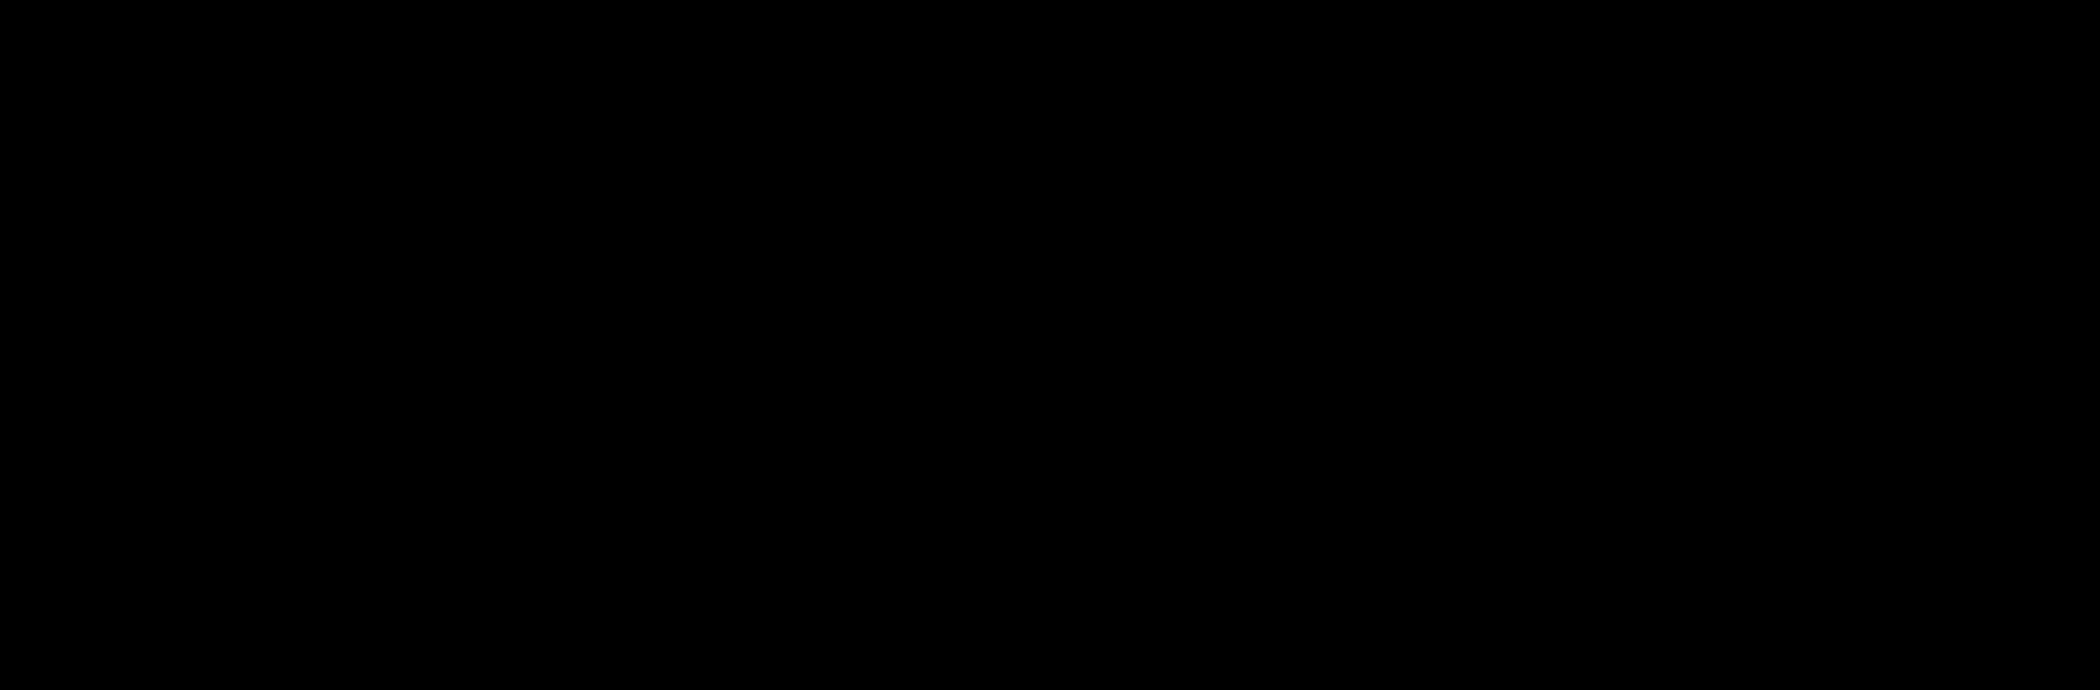 Aripiprazole-d<sub>8</sub> EP impurity C (butyl-d<sub>8</sub>)